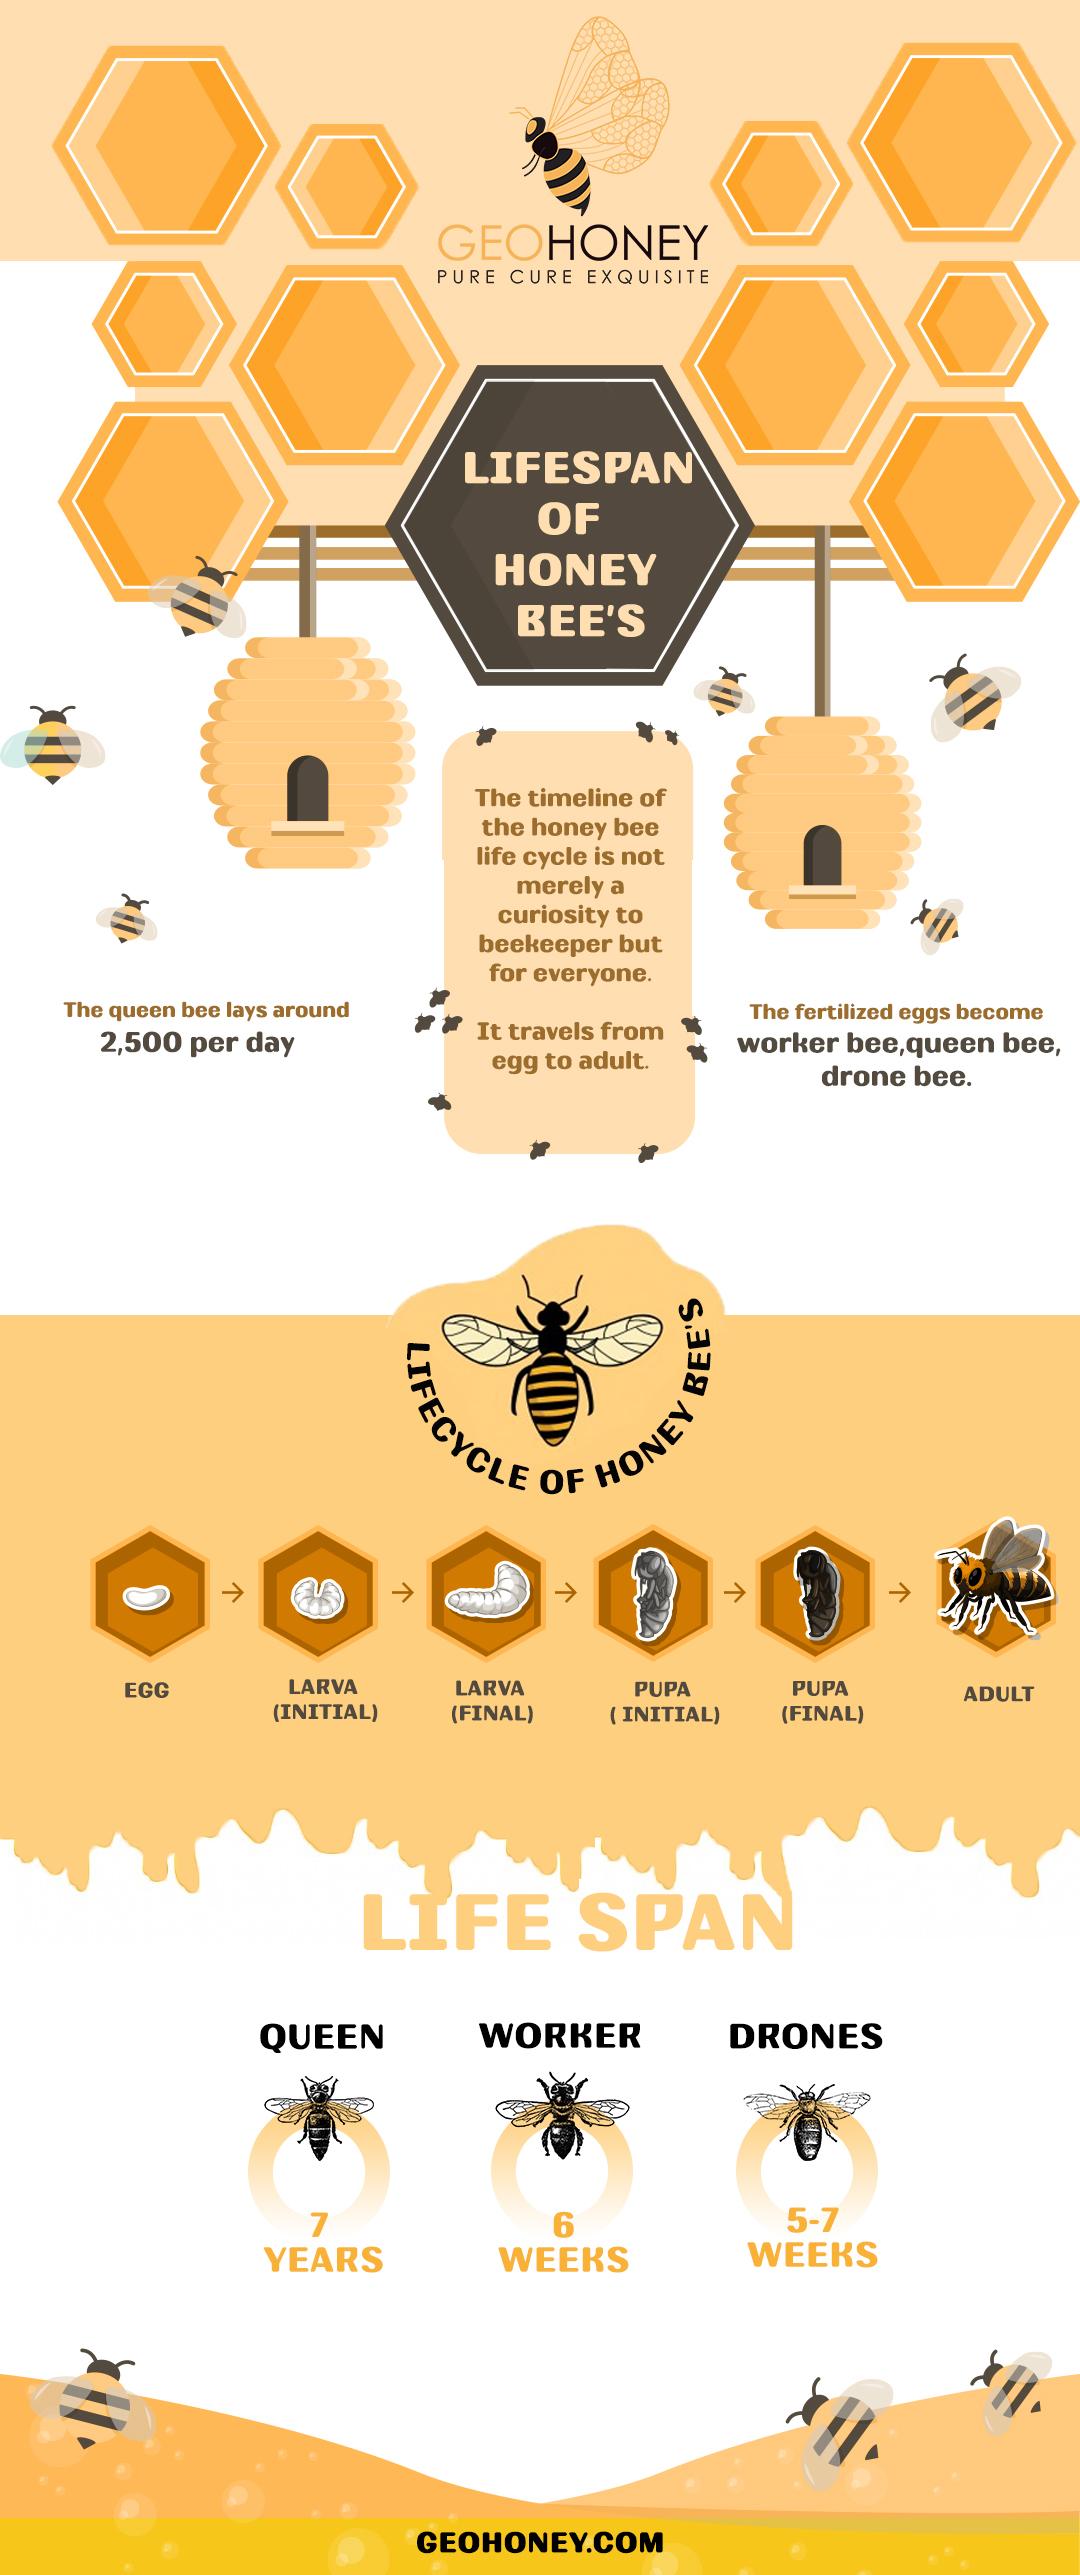 Lifespan of honey bees - GeoHoney